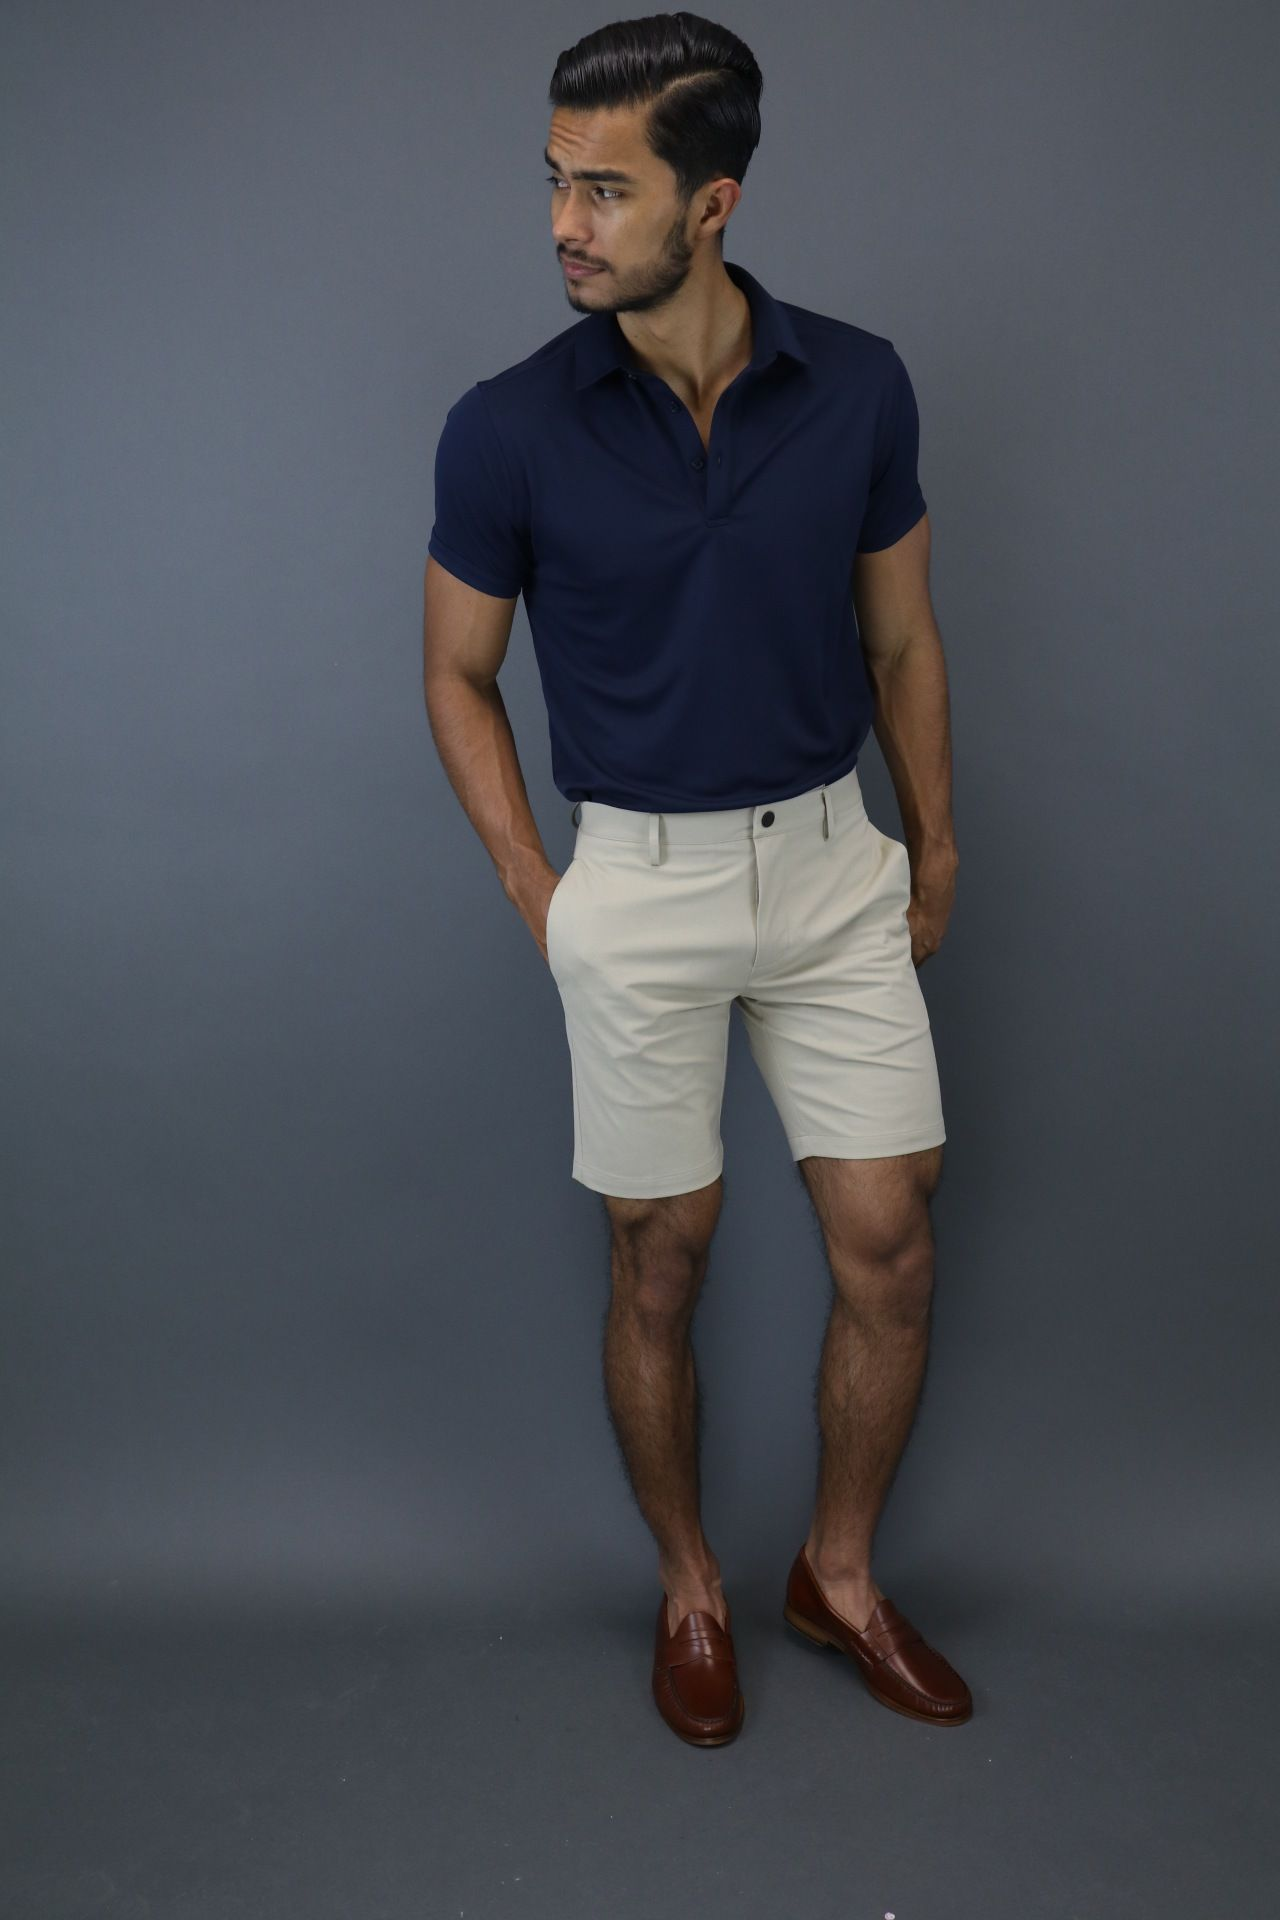 Men's Fashion Basics – Part 67 – Practical Winter Boots Men's Fashion Basics – Part 67 – Practical Winter Boots new images